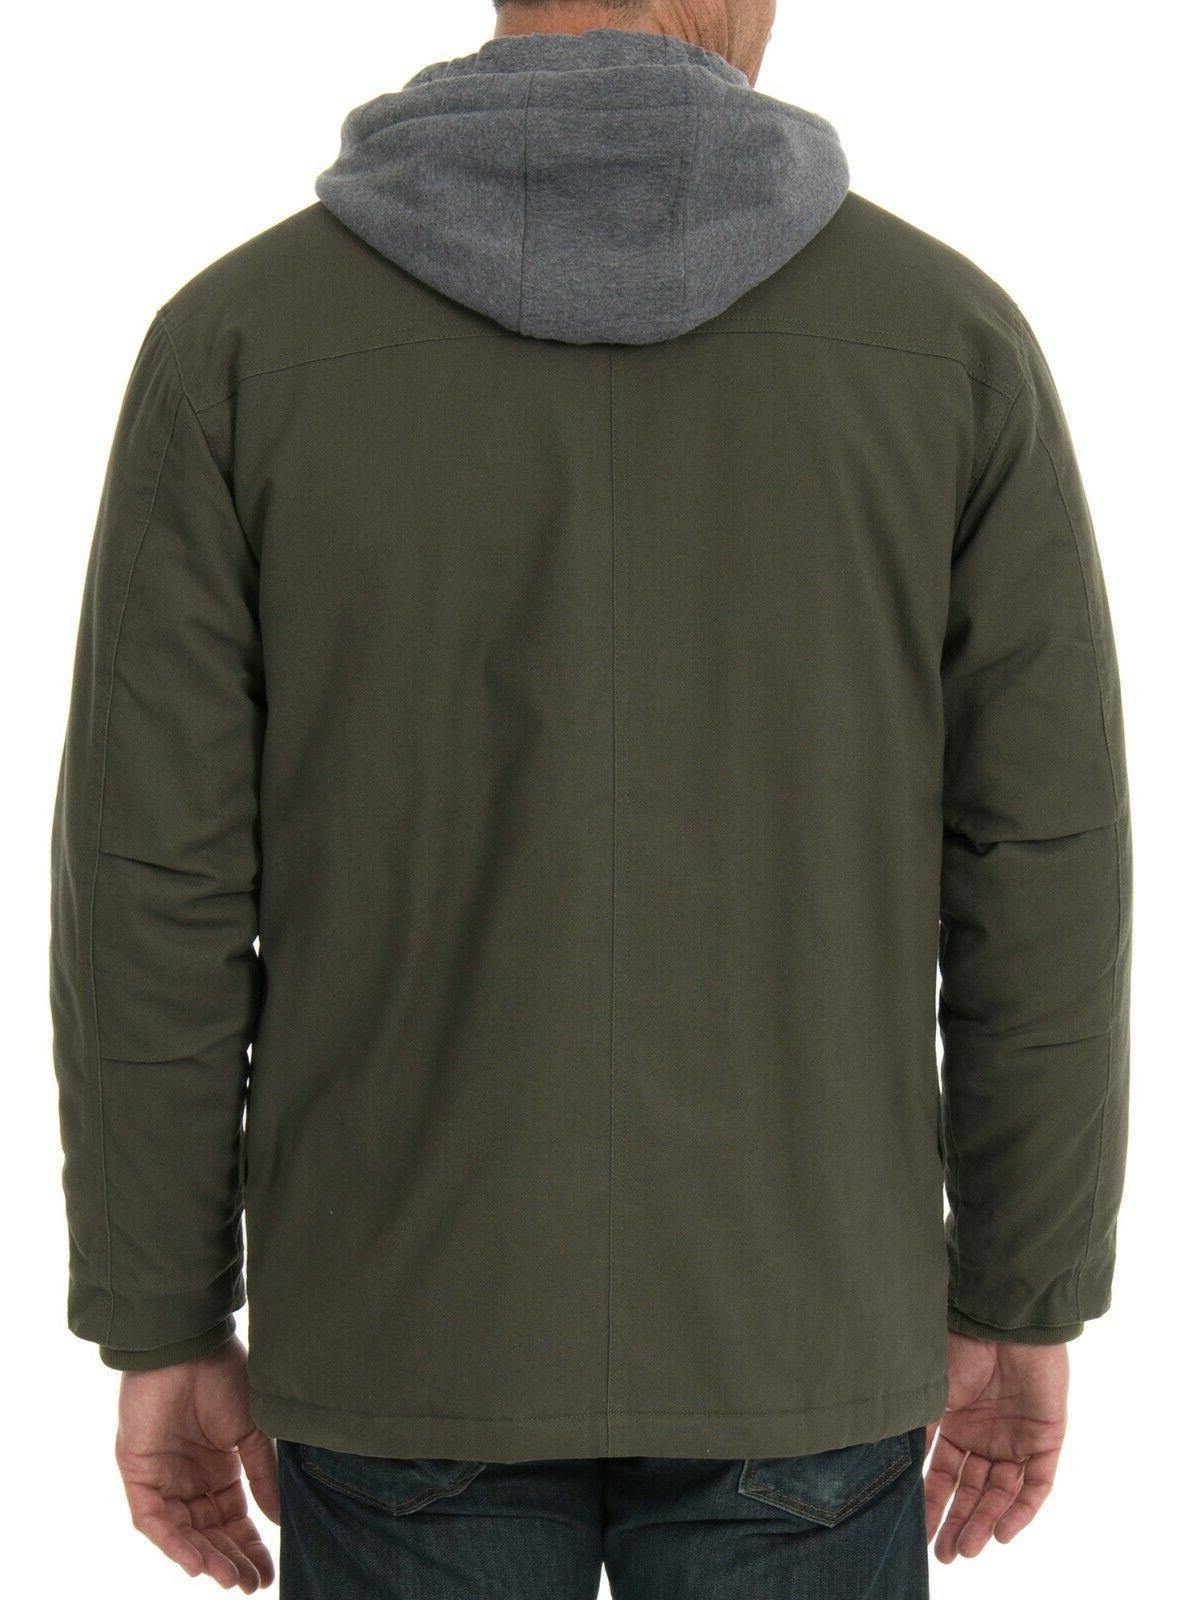 Men's Jacket Size Medium 38/40 Chest Lining NEW